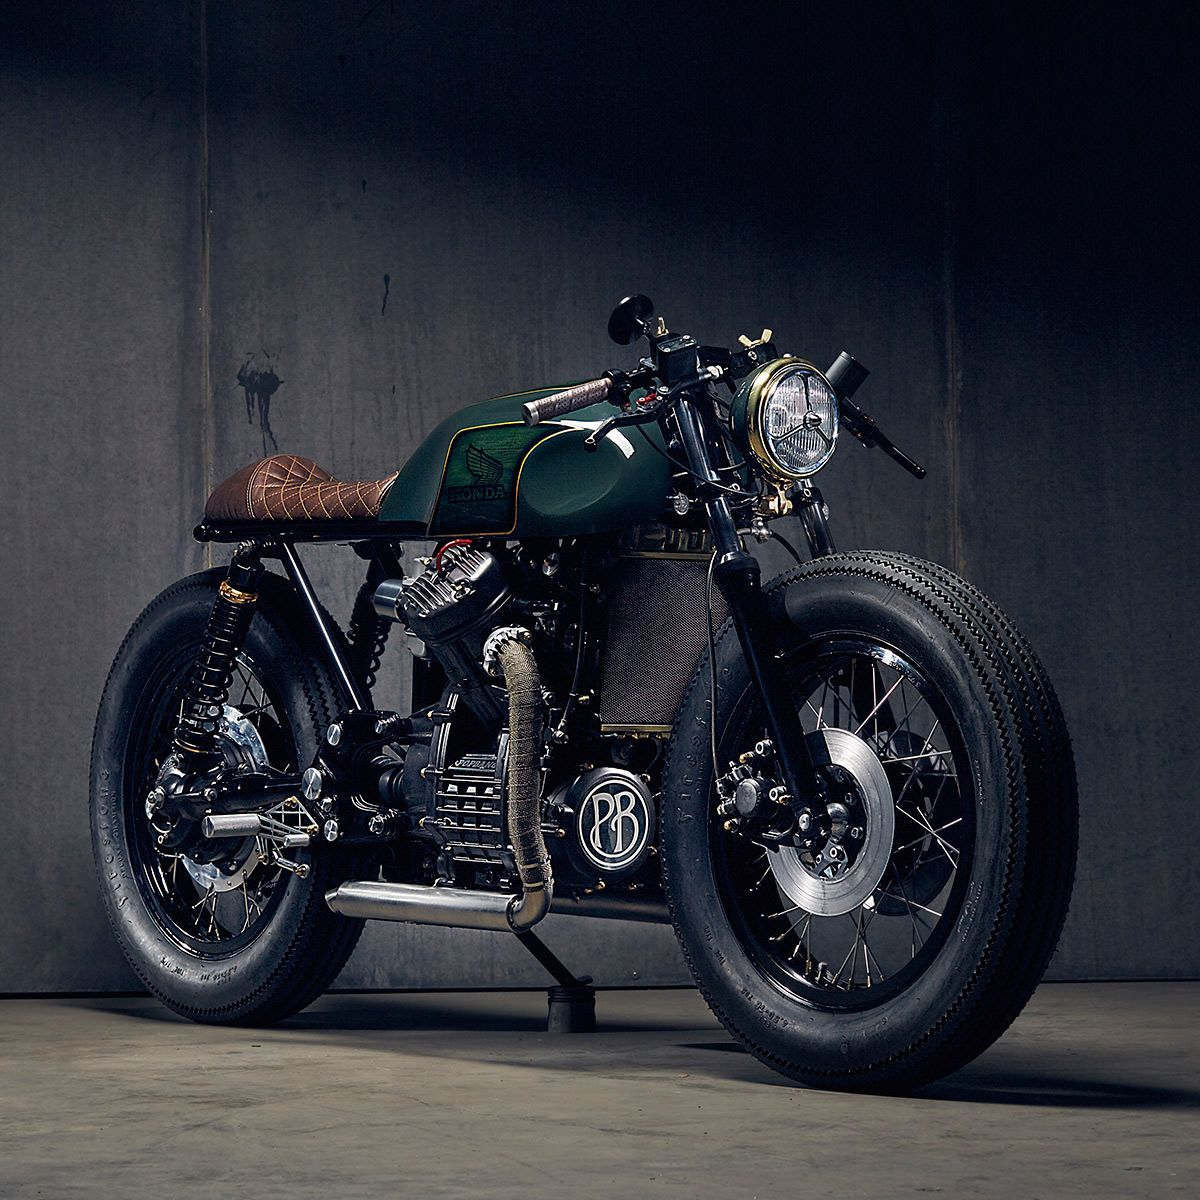 bad917d1cbbd2b355d3874f98e351fe2 best 25 custom motorcycle parts ideas on pinterest chopper  at gsmx.co